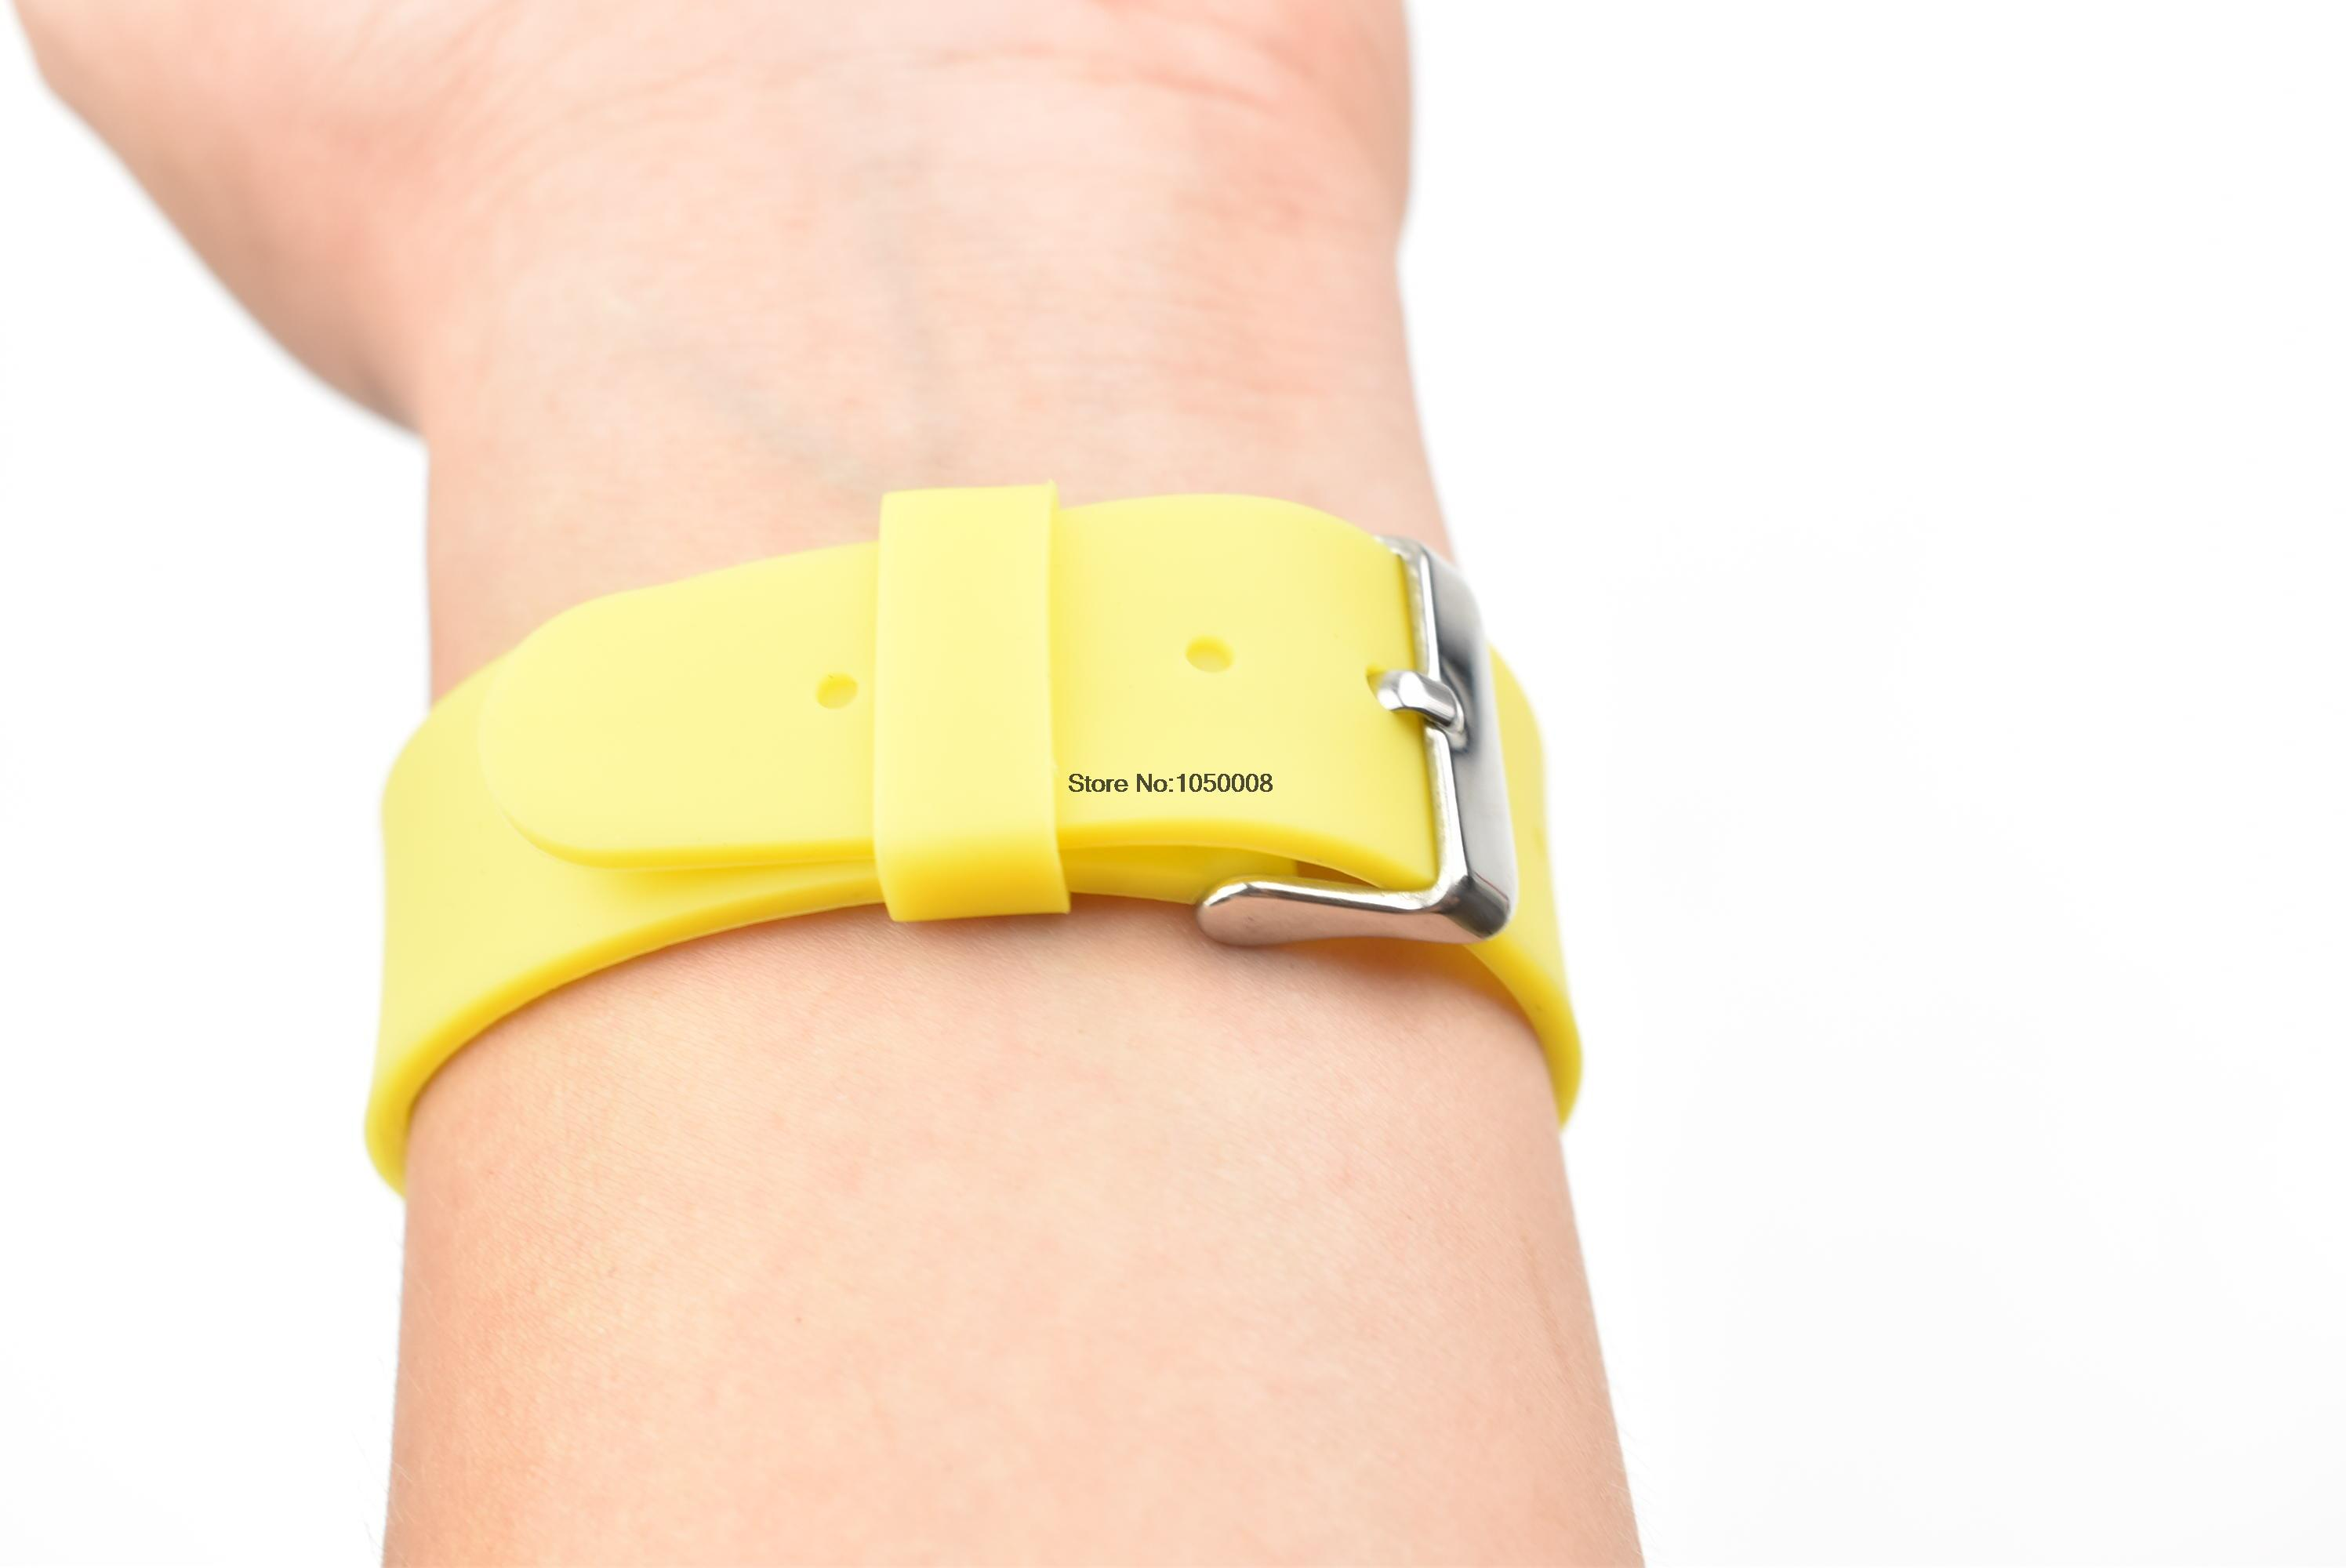 50pcs/lot 125Khz ID EM4100 RFID Smart wristband silicone electronic bracelets wrist band nfc 10pcs lot 13 56mhz rfid wristband silicone electronic bracelets wrist band nfc smart mf 1k s50